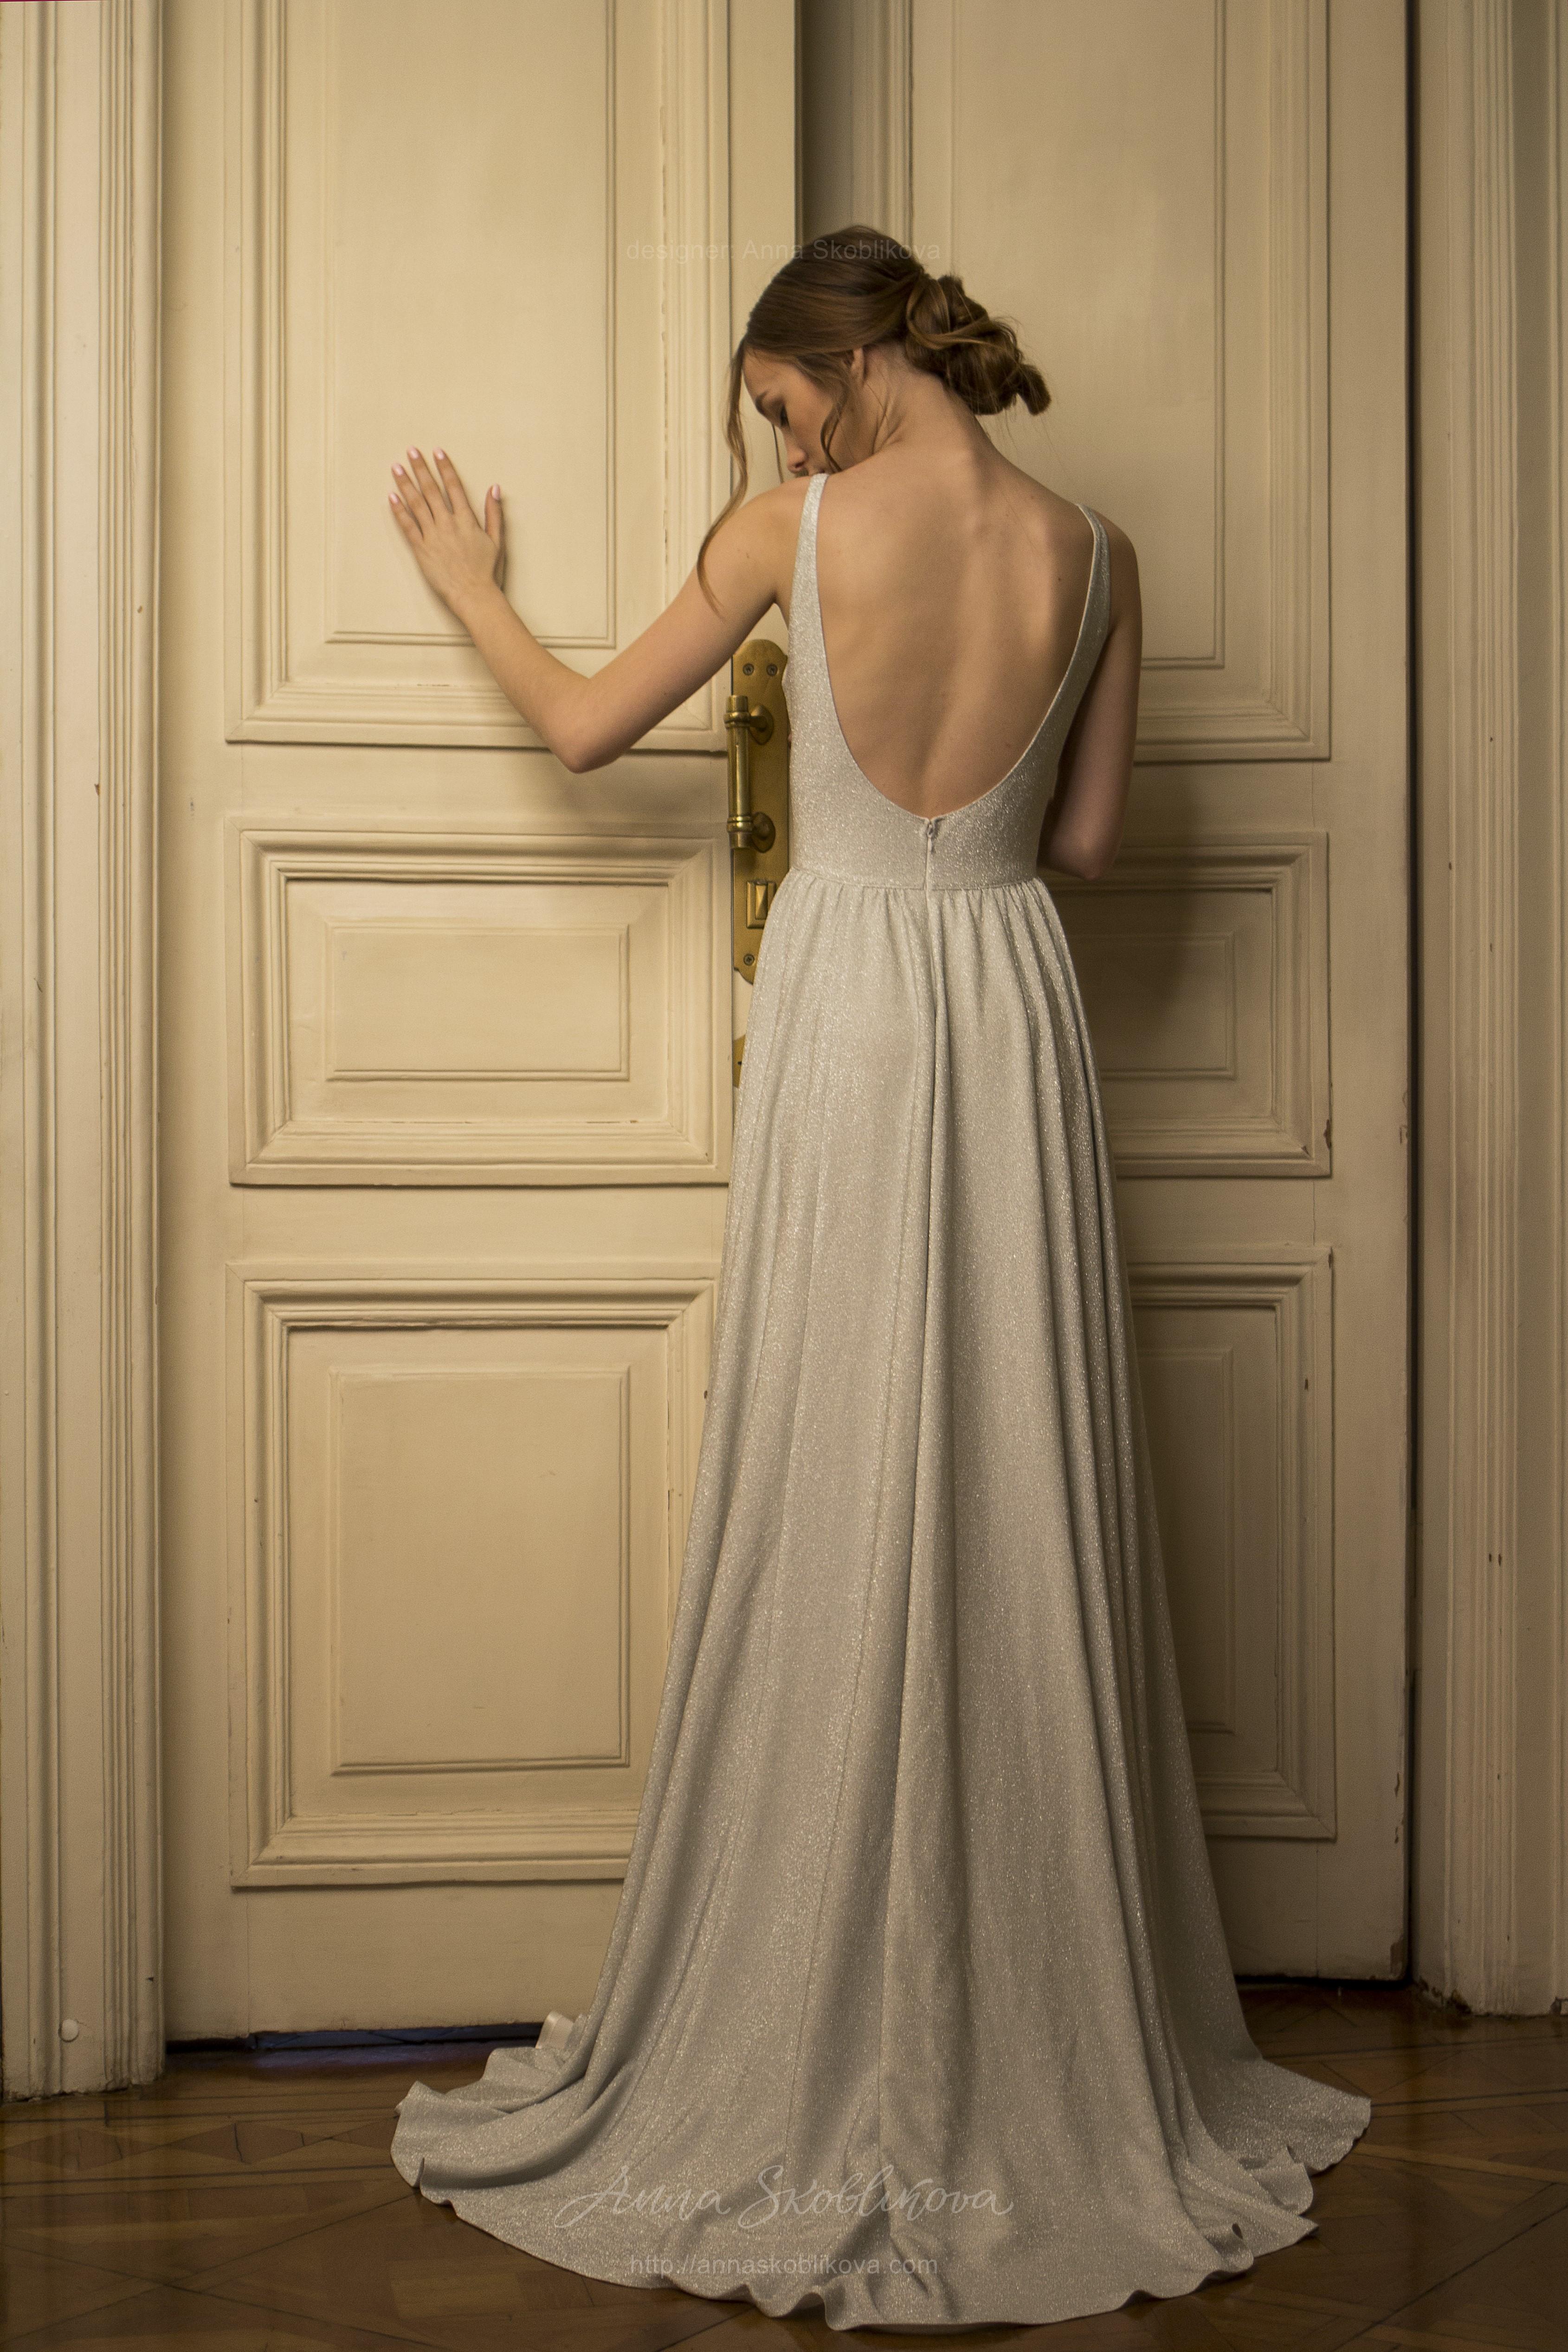 Simple Sexy Wedding Dress